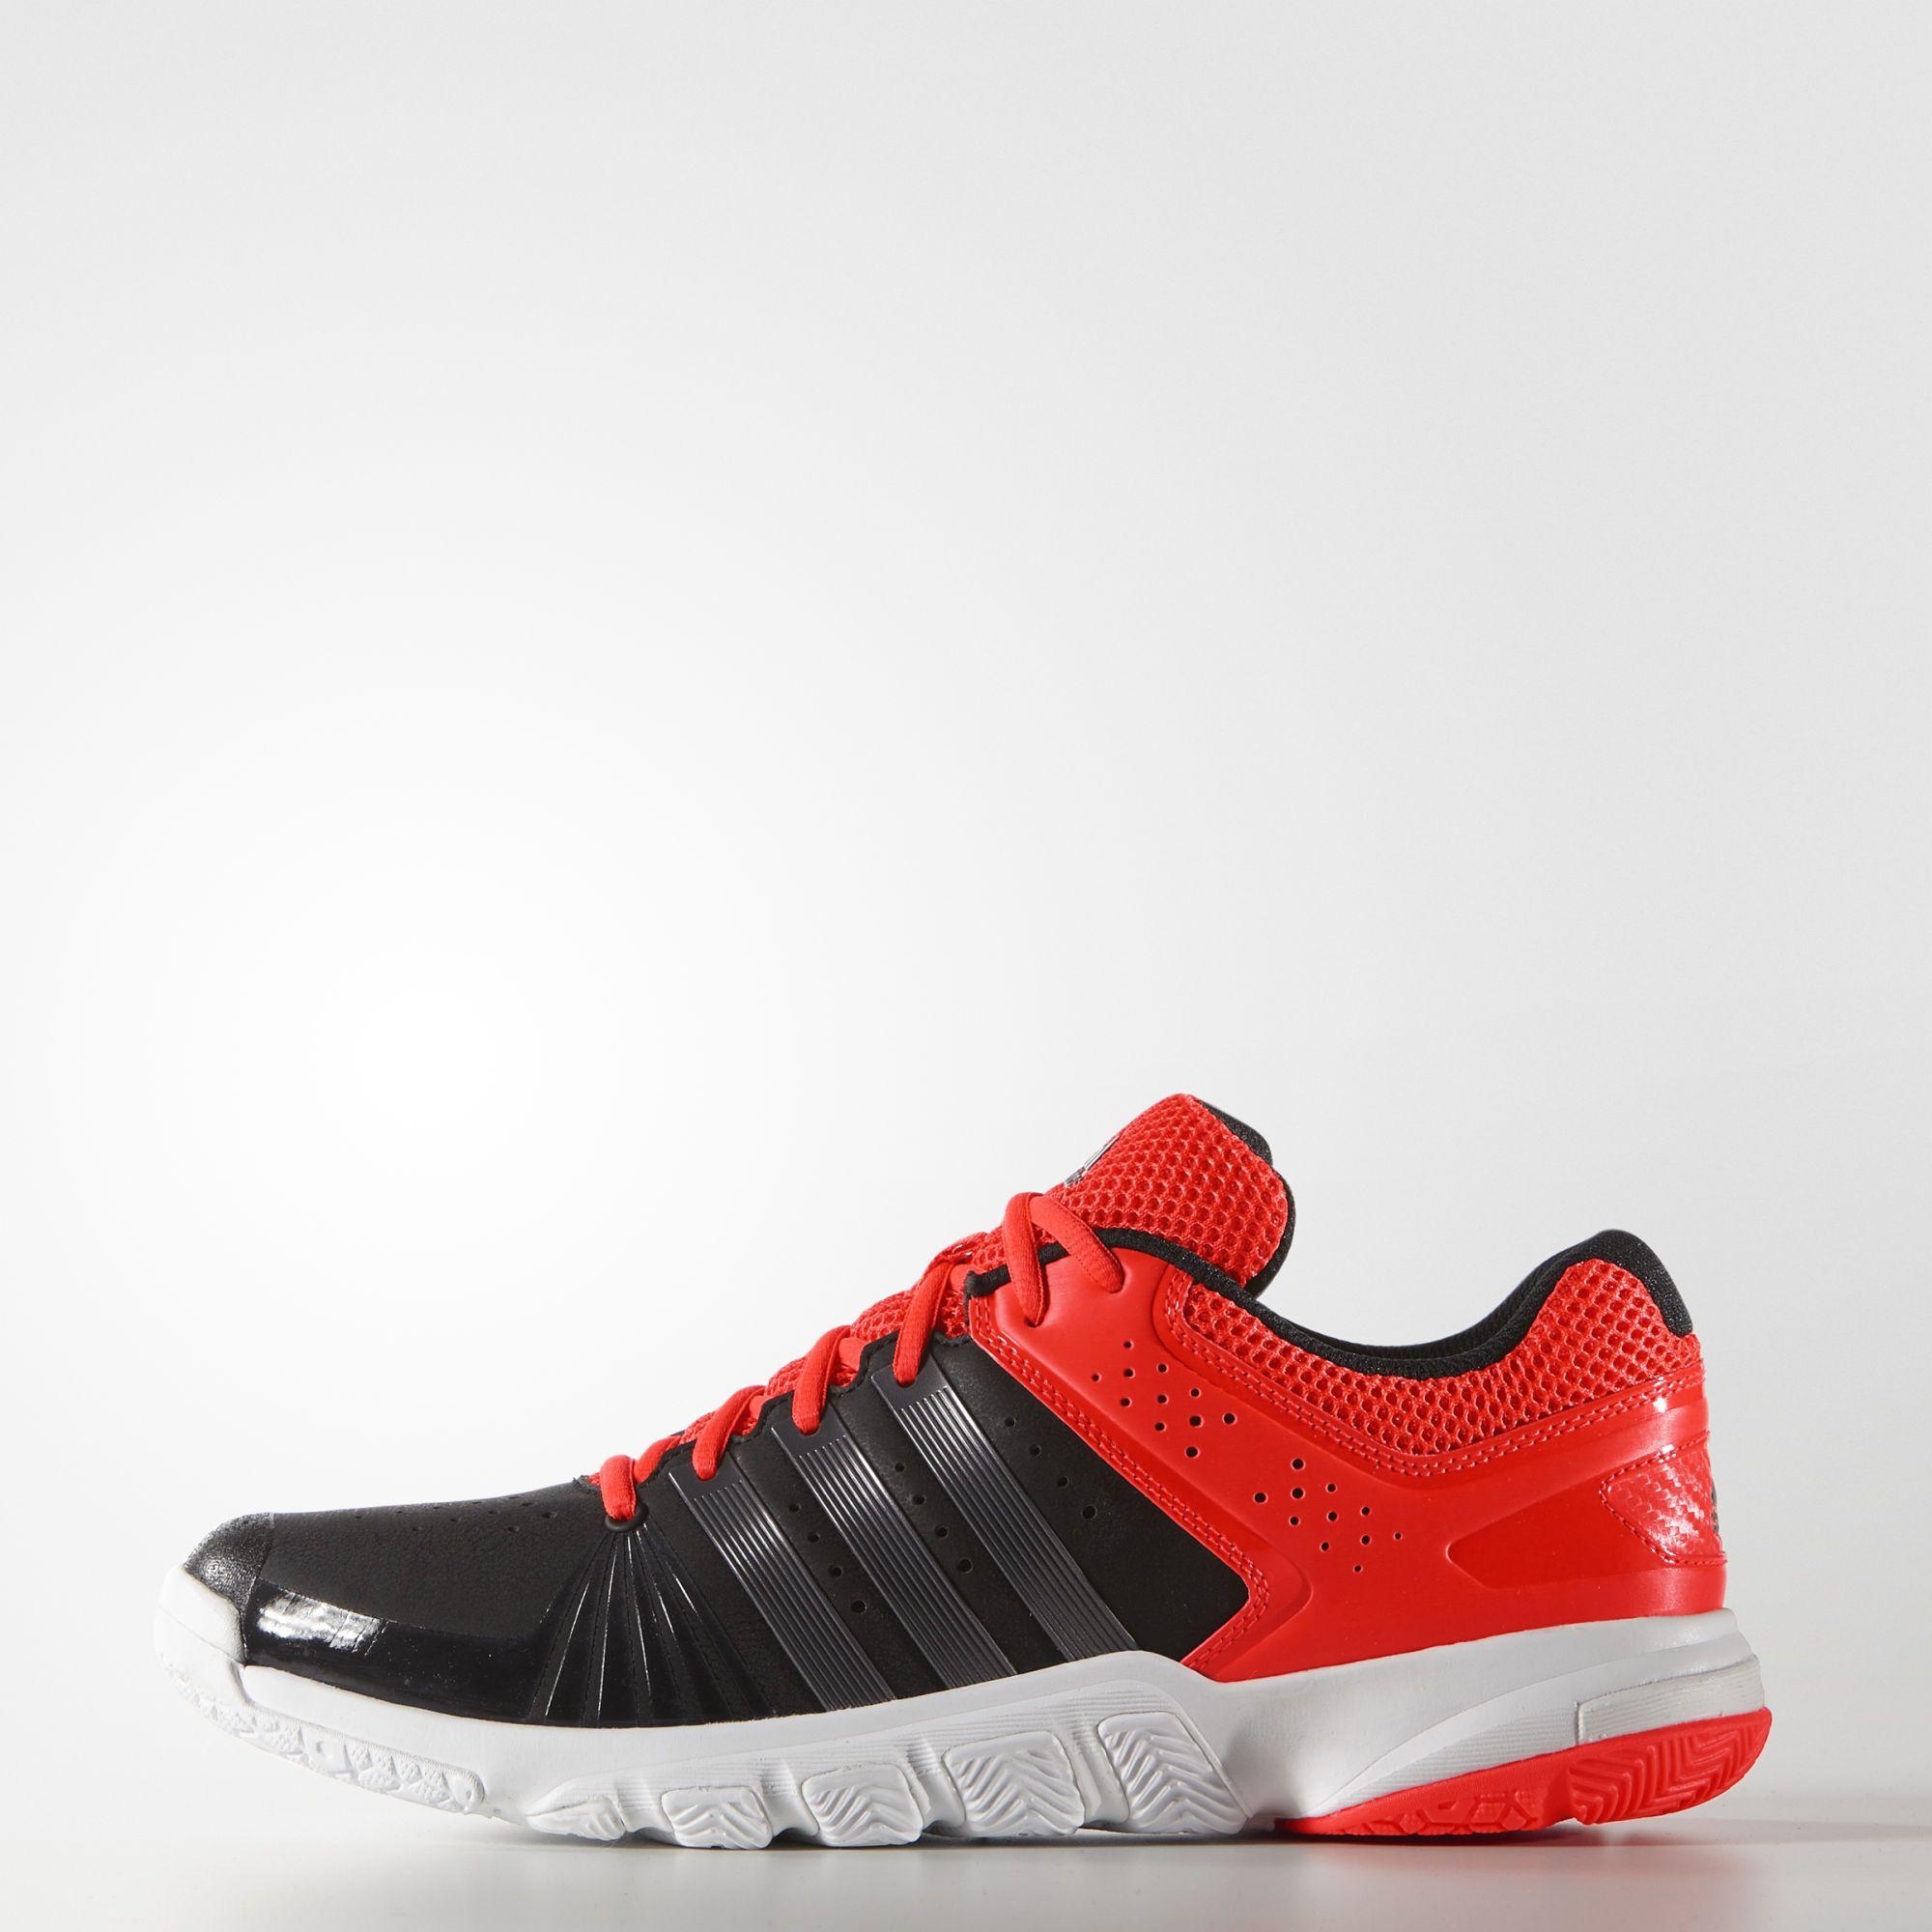 Chaussure Quickforce adidas Badminton Wishlist Pinterest